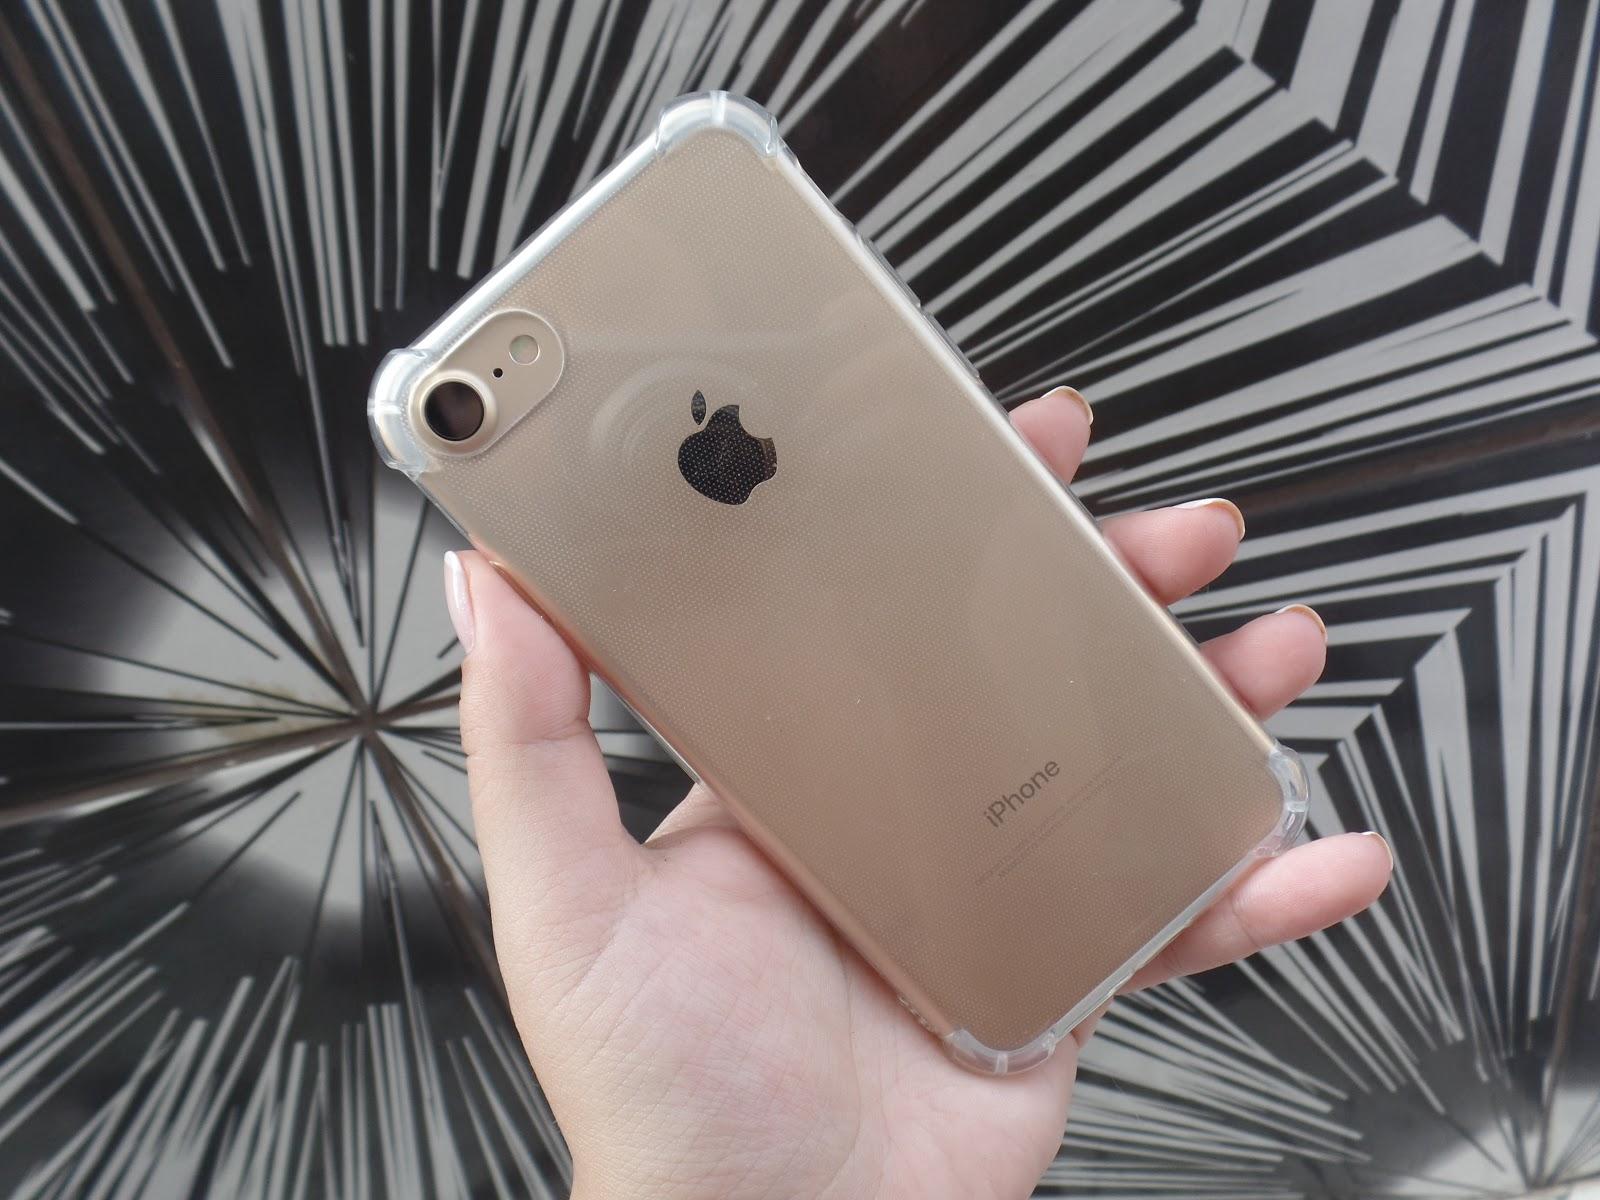 https://www.banggood.com/Air-Cushion-Soft-TPU-Transparent-Shockproof-Case-For-iPhone-7-8-p-1133100.html?utm_source=seo&utm_medium=organic&utm_campaign=14878842&utm_content=10360